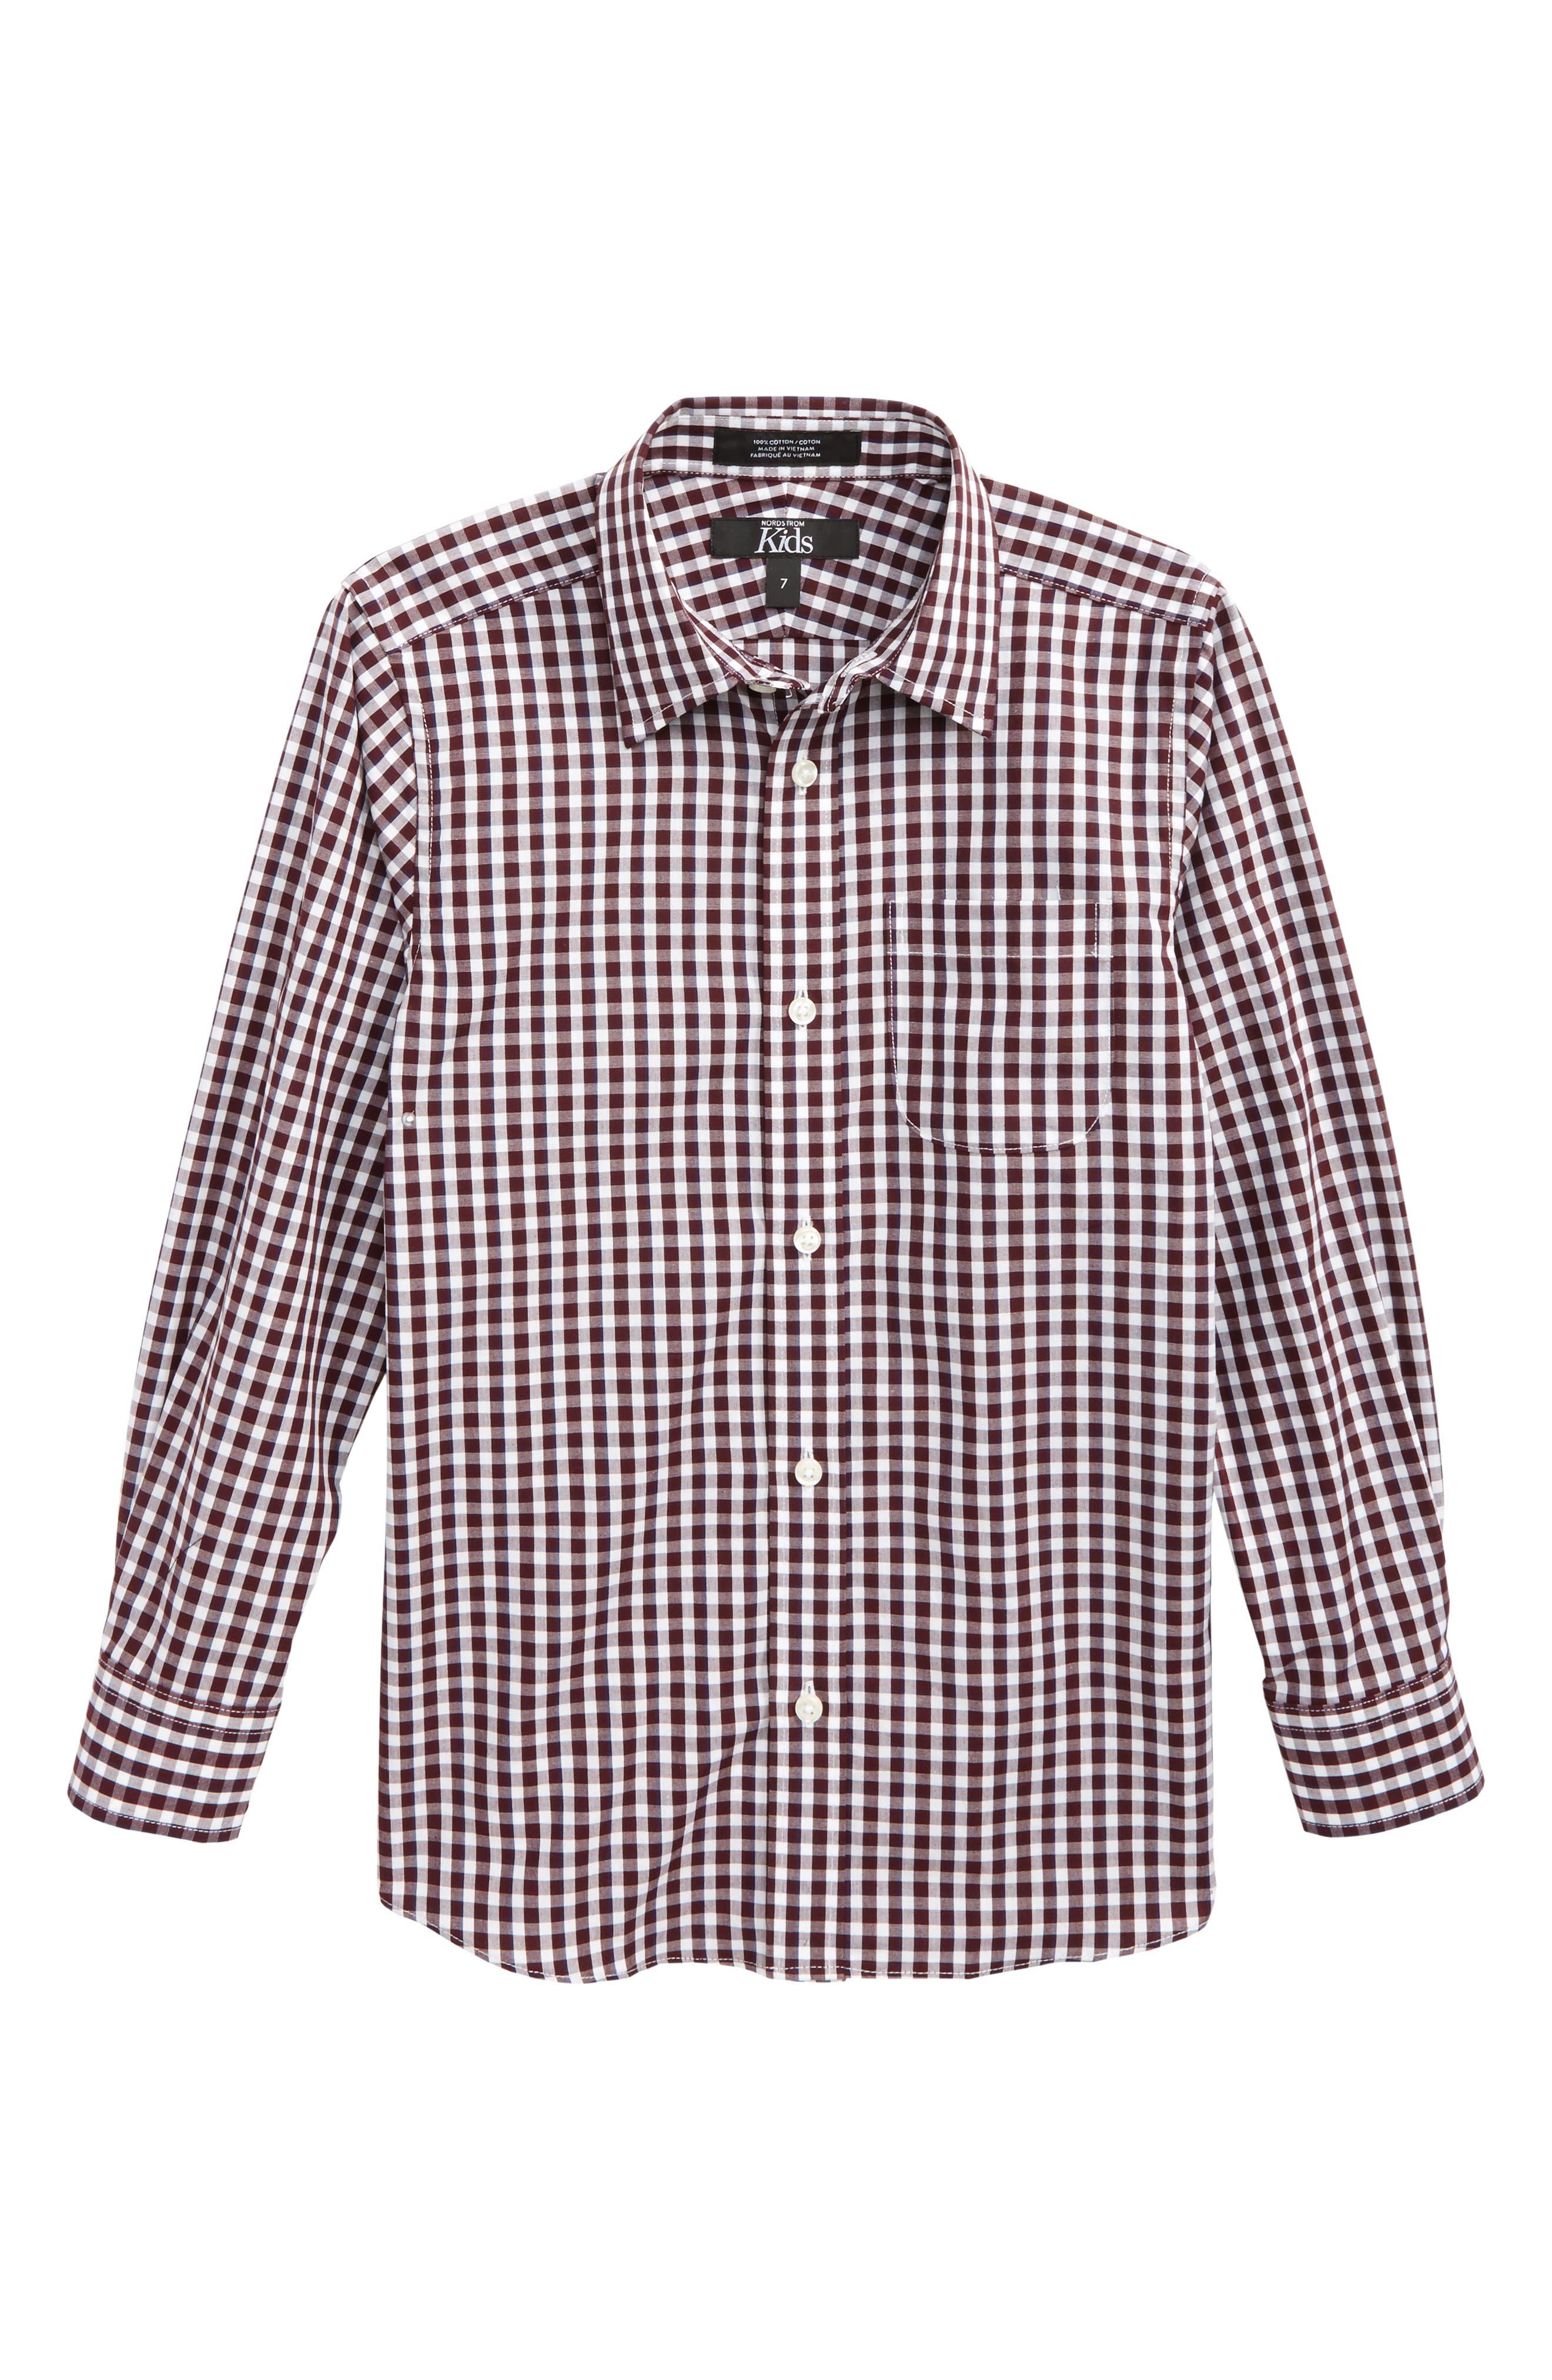 Main Image - Nordstrom Check Dress Shirt (Toddler Boys, Little Boys & Big Boys)